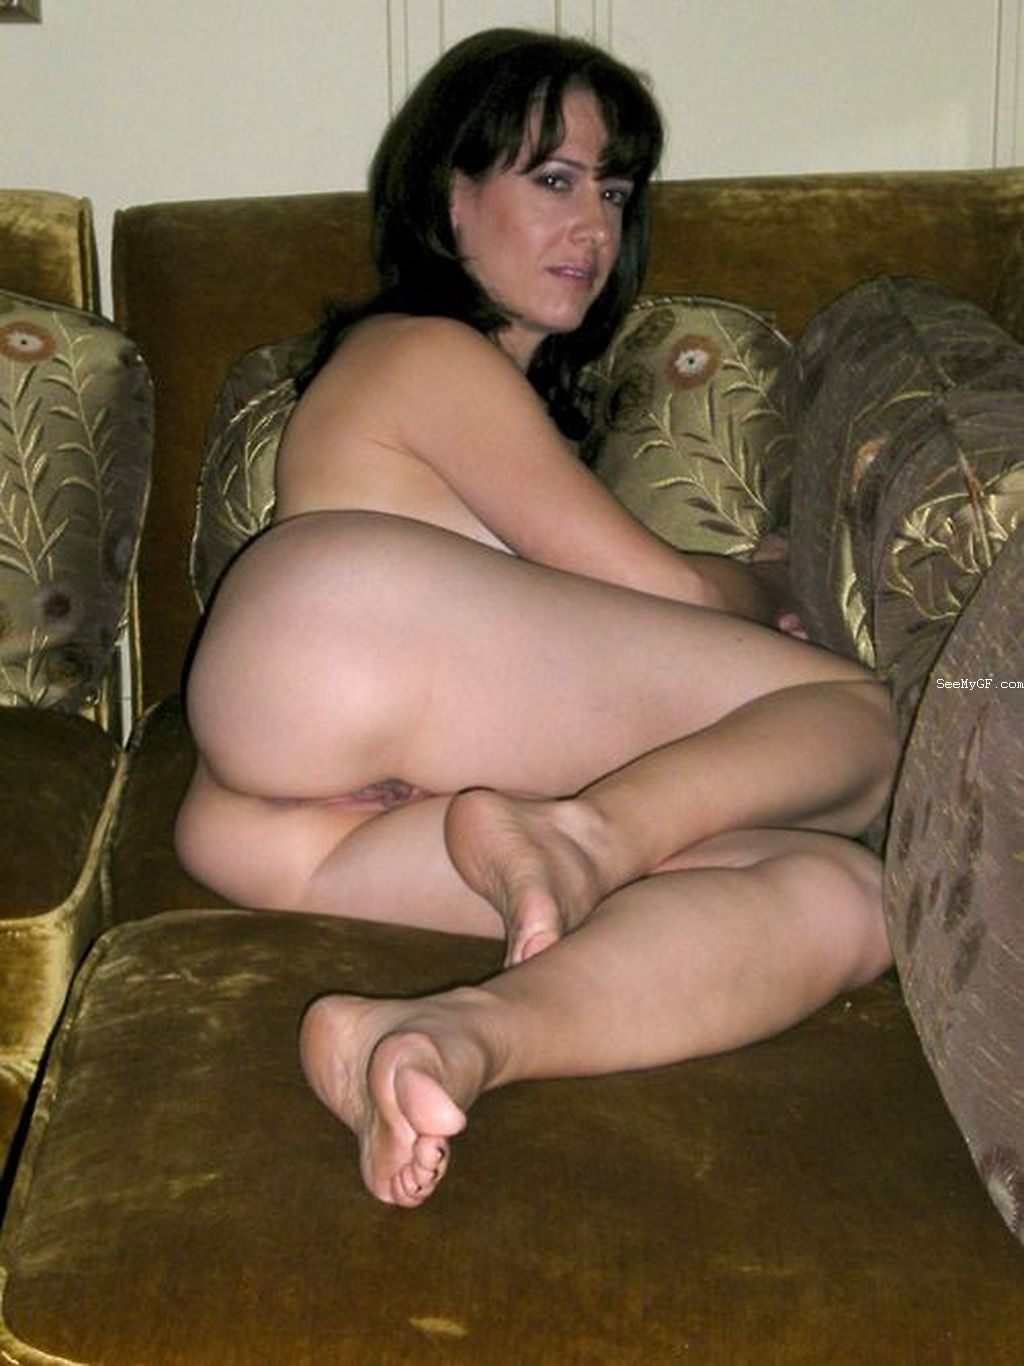 see my gf nude